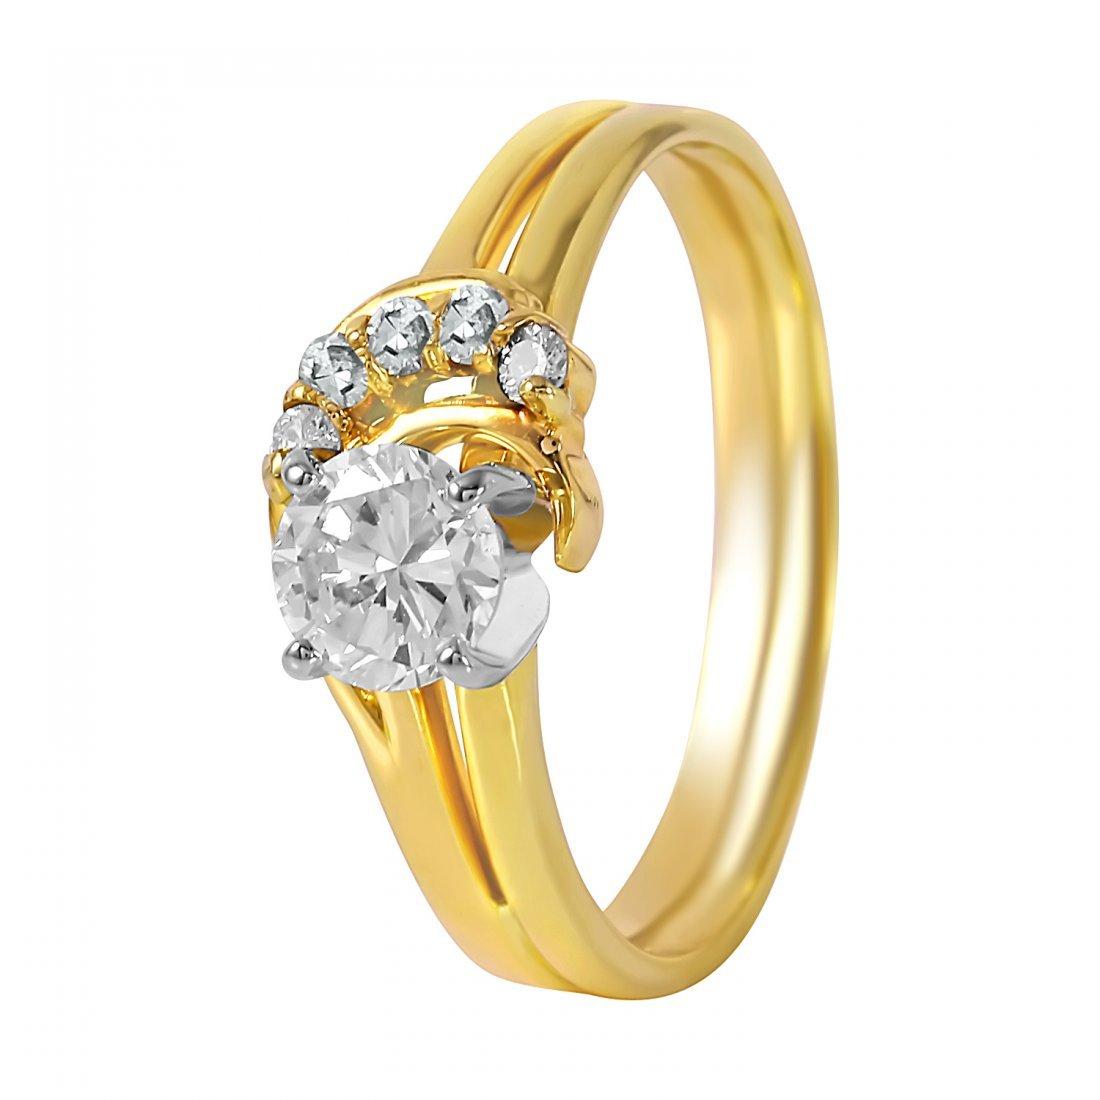 14KT Yellow Gold Diamond Engagement Ring - #222